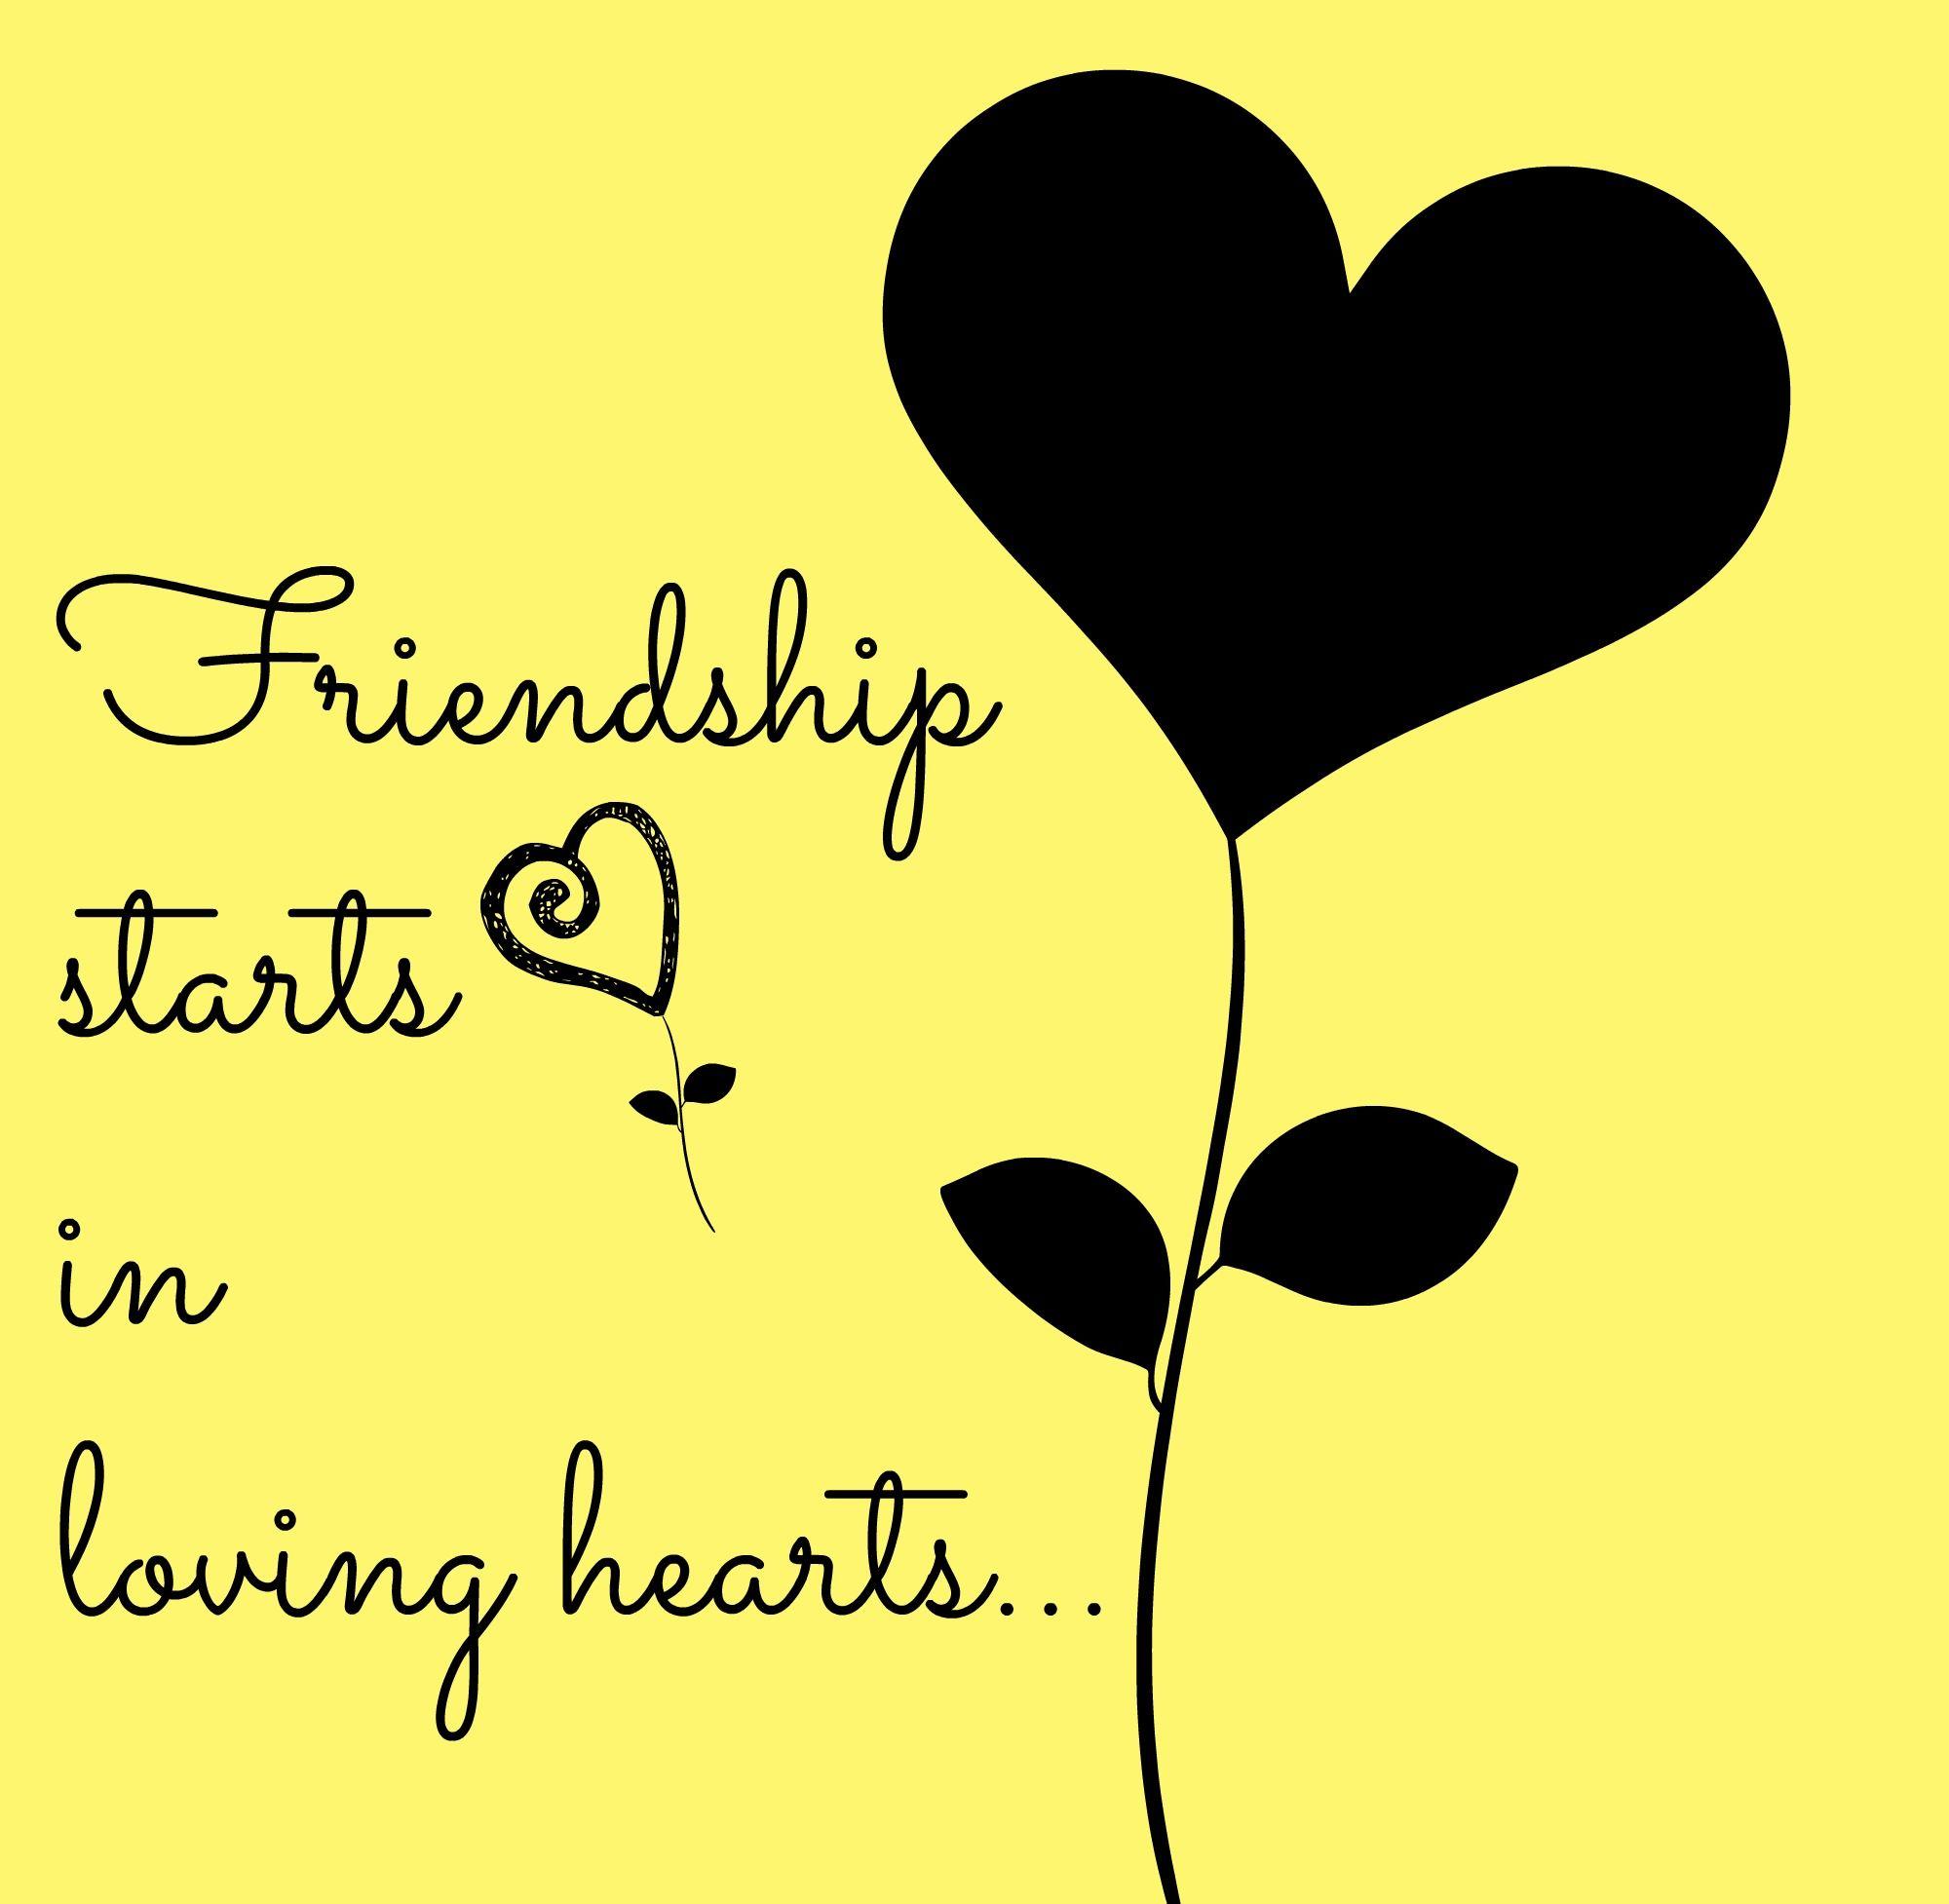 Pin By Hazel Borland On I Believe Love Friendship Quotes Friendship Quotes Images Friendship Quotes